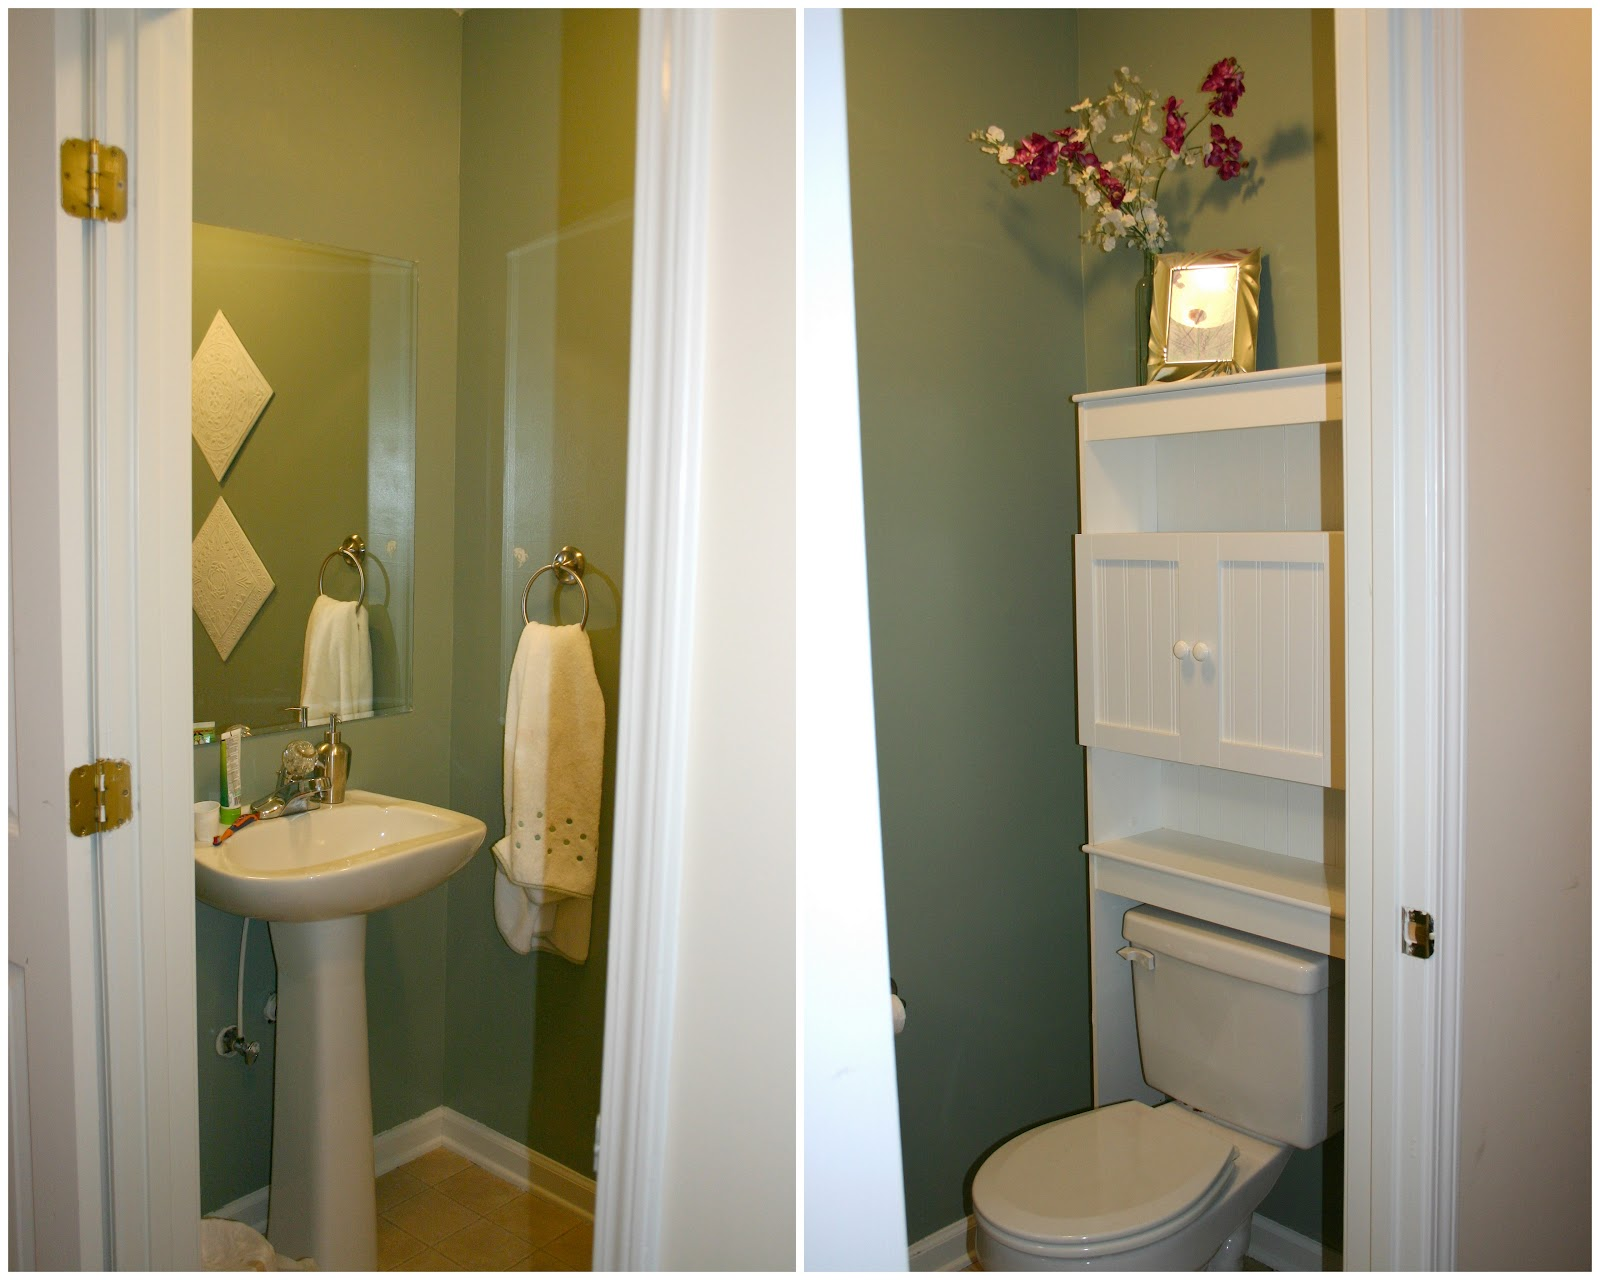 Half Bathroom Displaying Images For Very Small Half Bathrooms